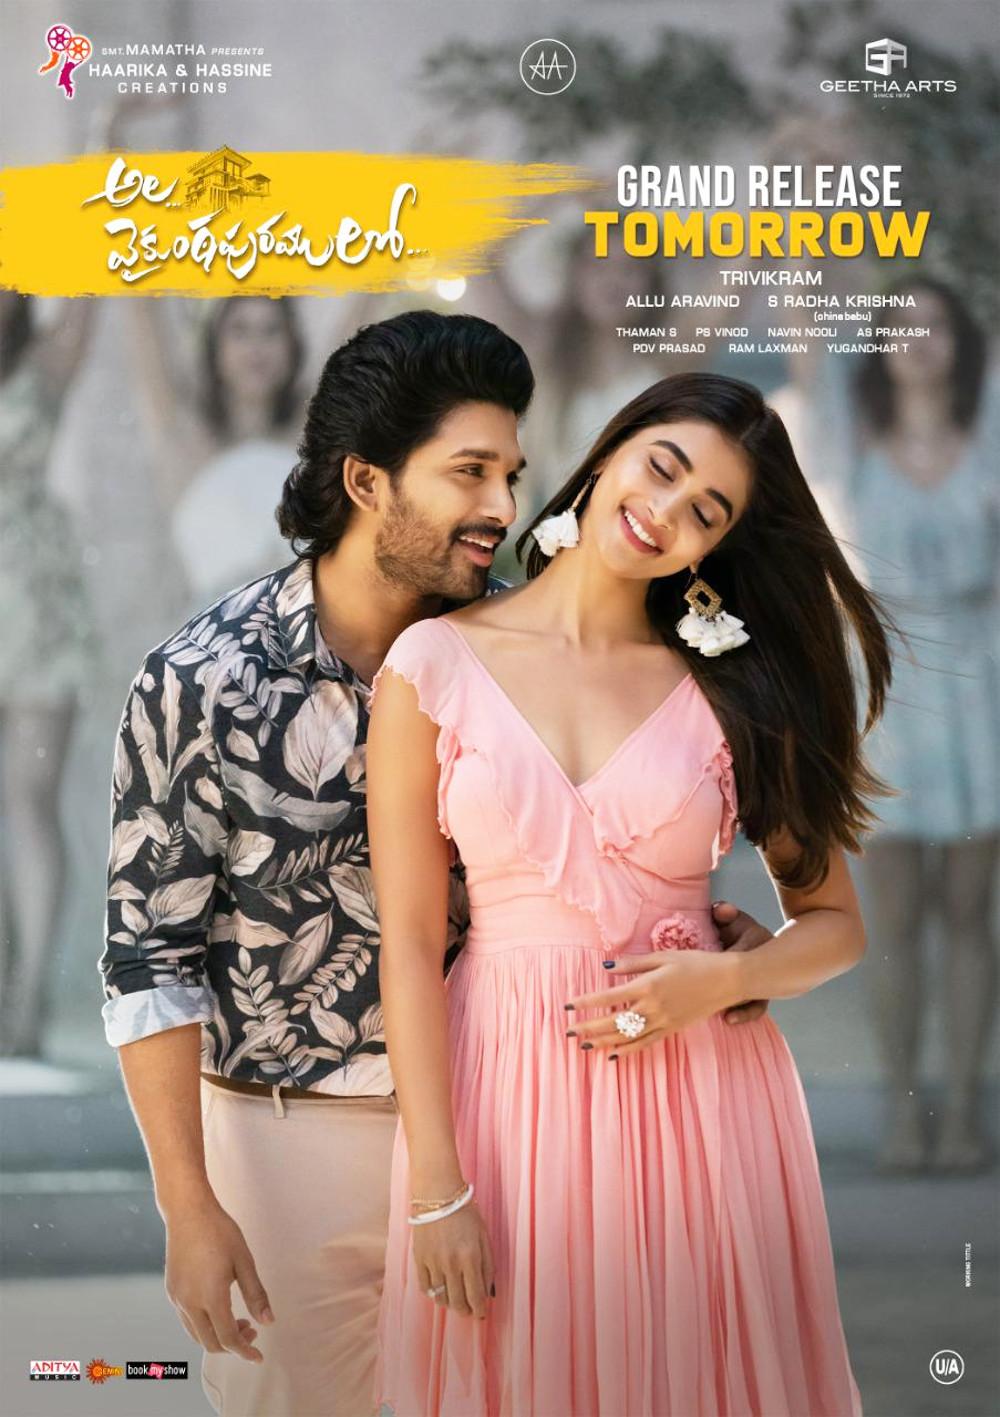 Allu Arjun Pooja Hegde Ala Vaikunthapurramuloo Movie Release Tomorrow Posters HD